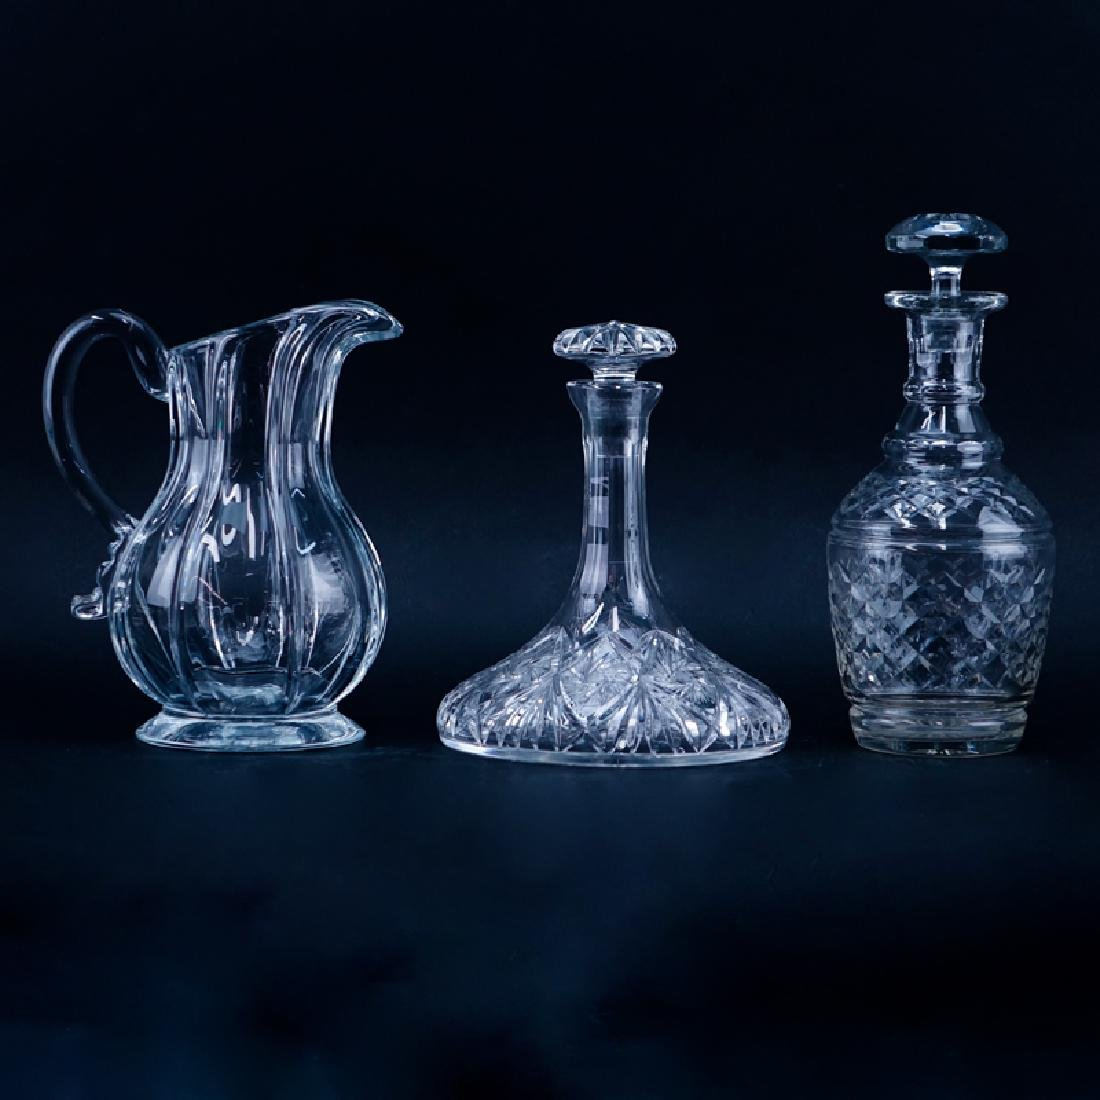 Two (2) Vintage Glass Decanters, One (1) Metropolitan